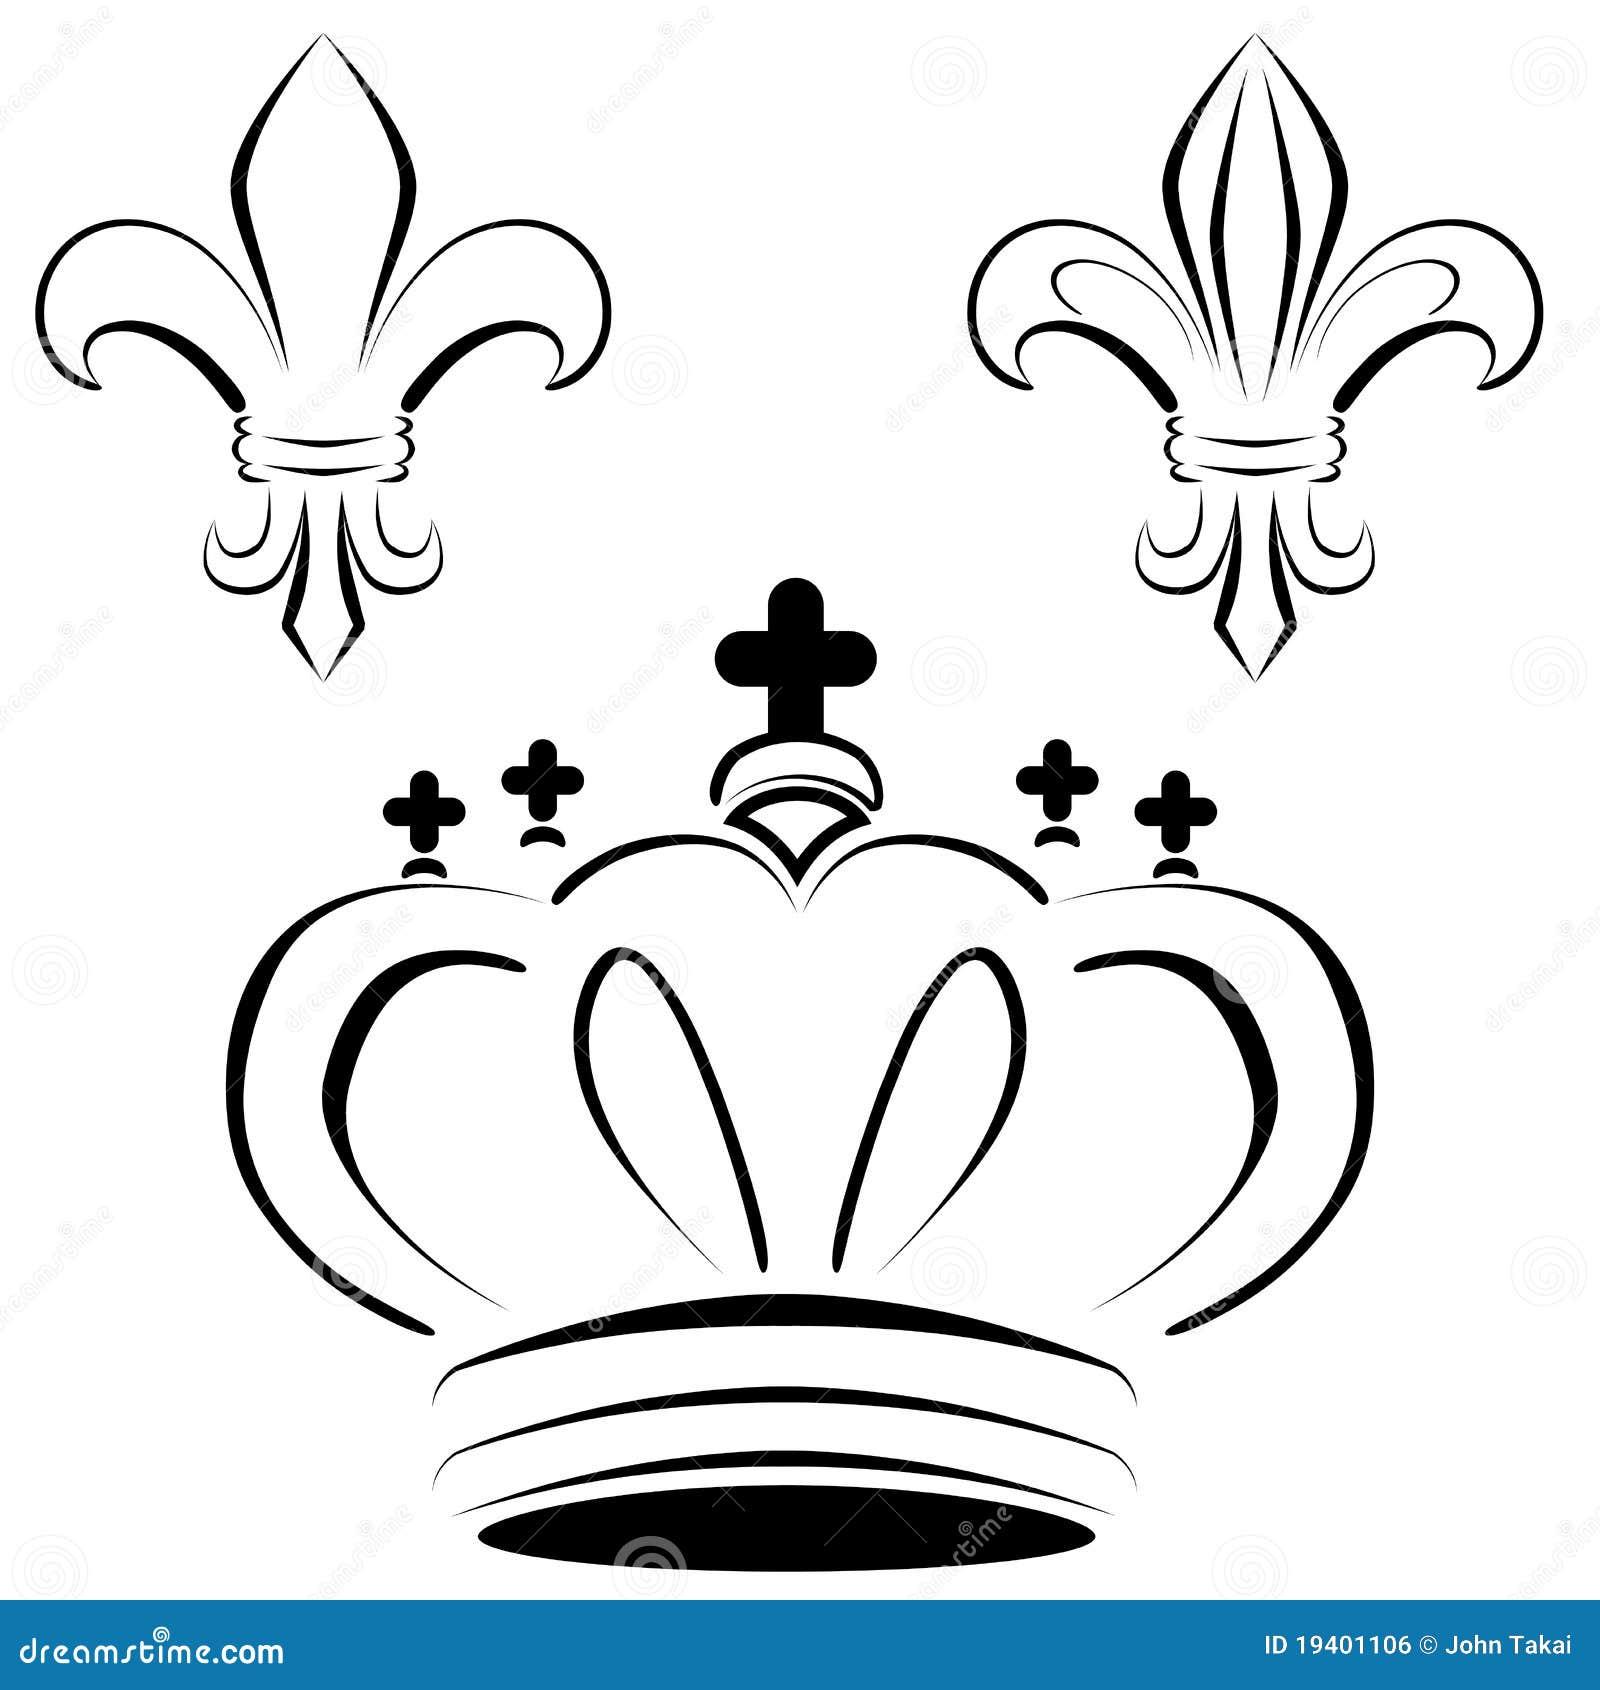 One Line Ascii Art Crown : Royal crown fleur art royalty free stock image